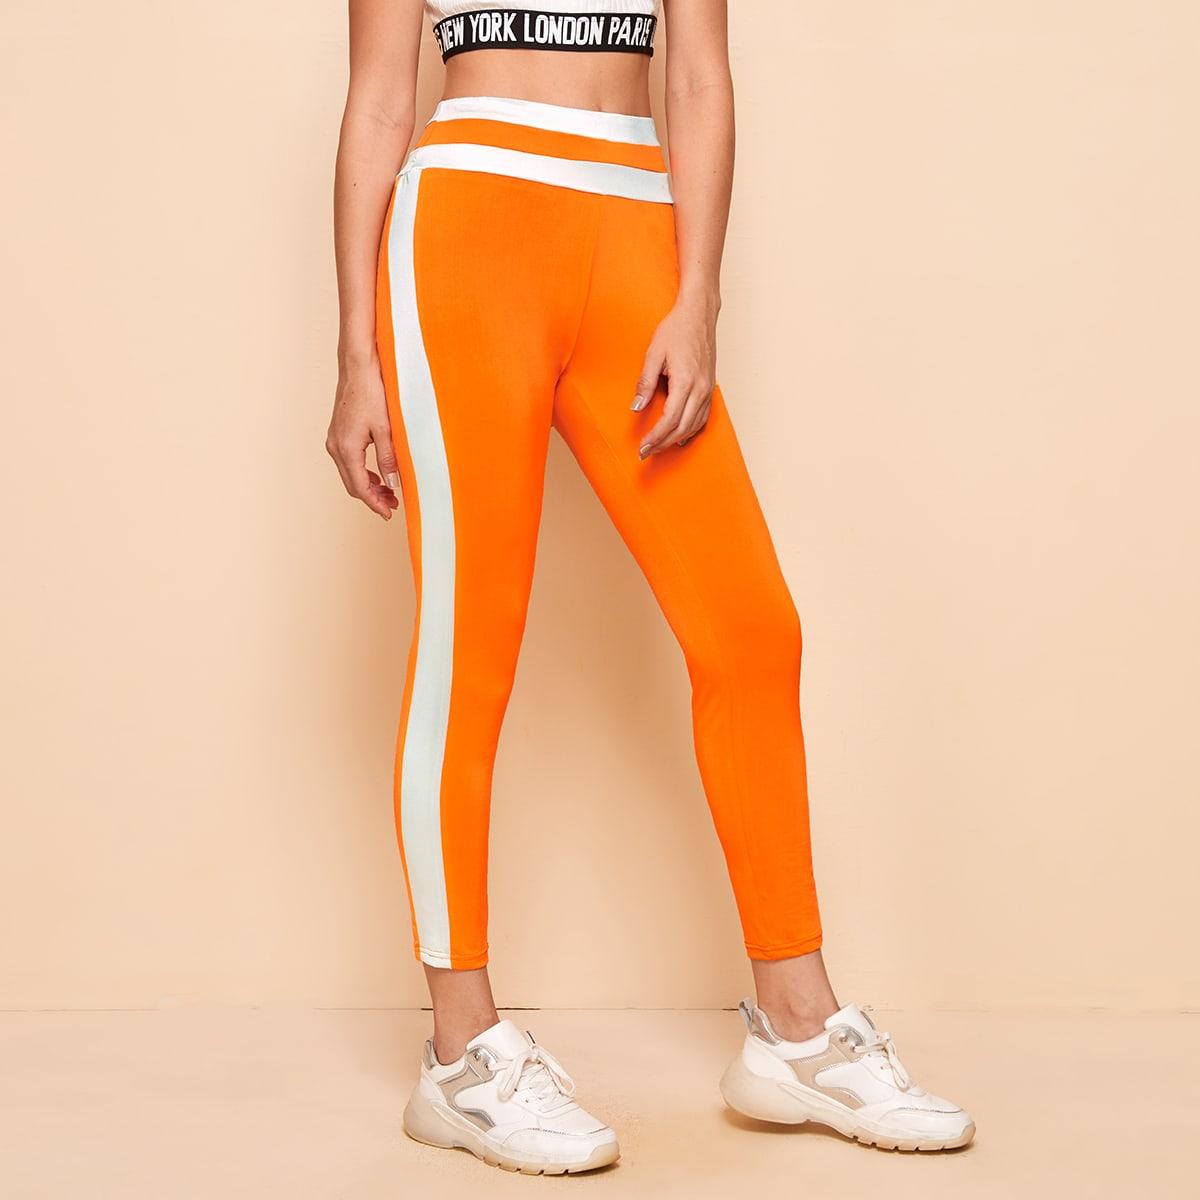 SHEIN / Leggings de cintura alta con costura lateral en contraste